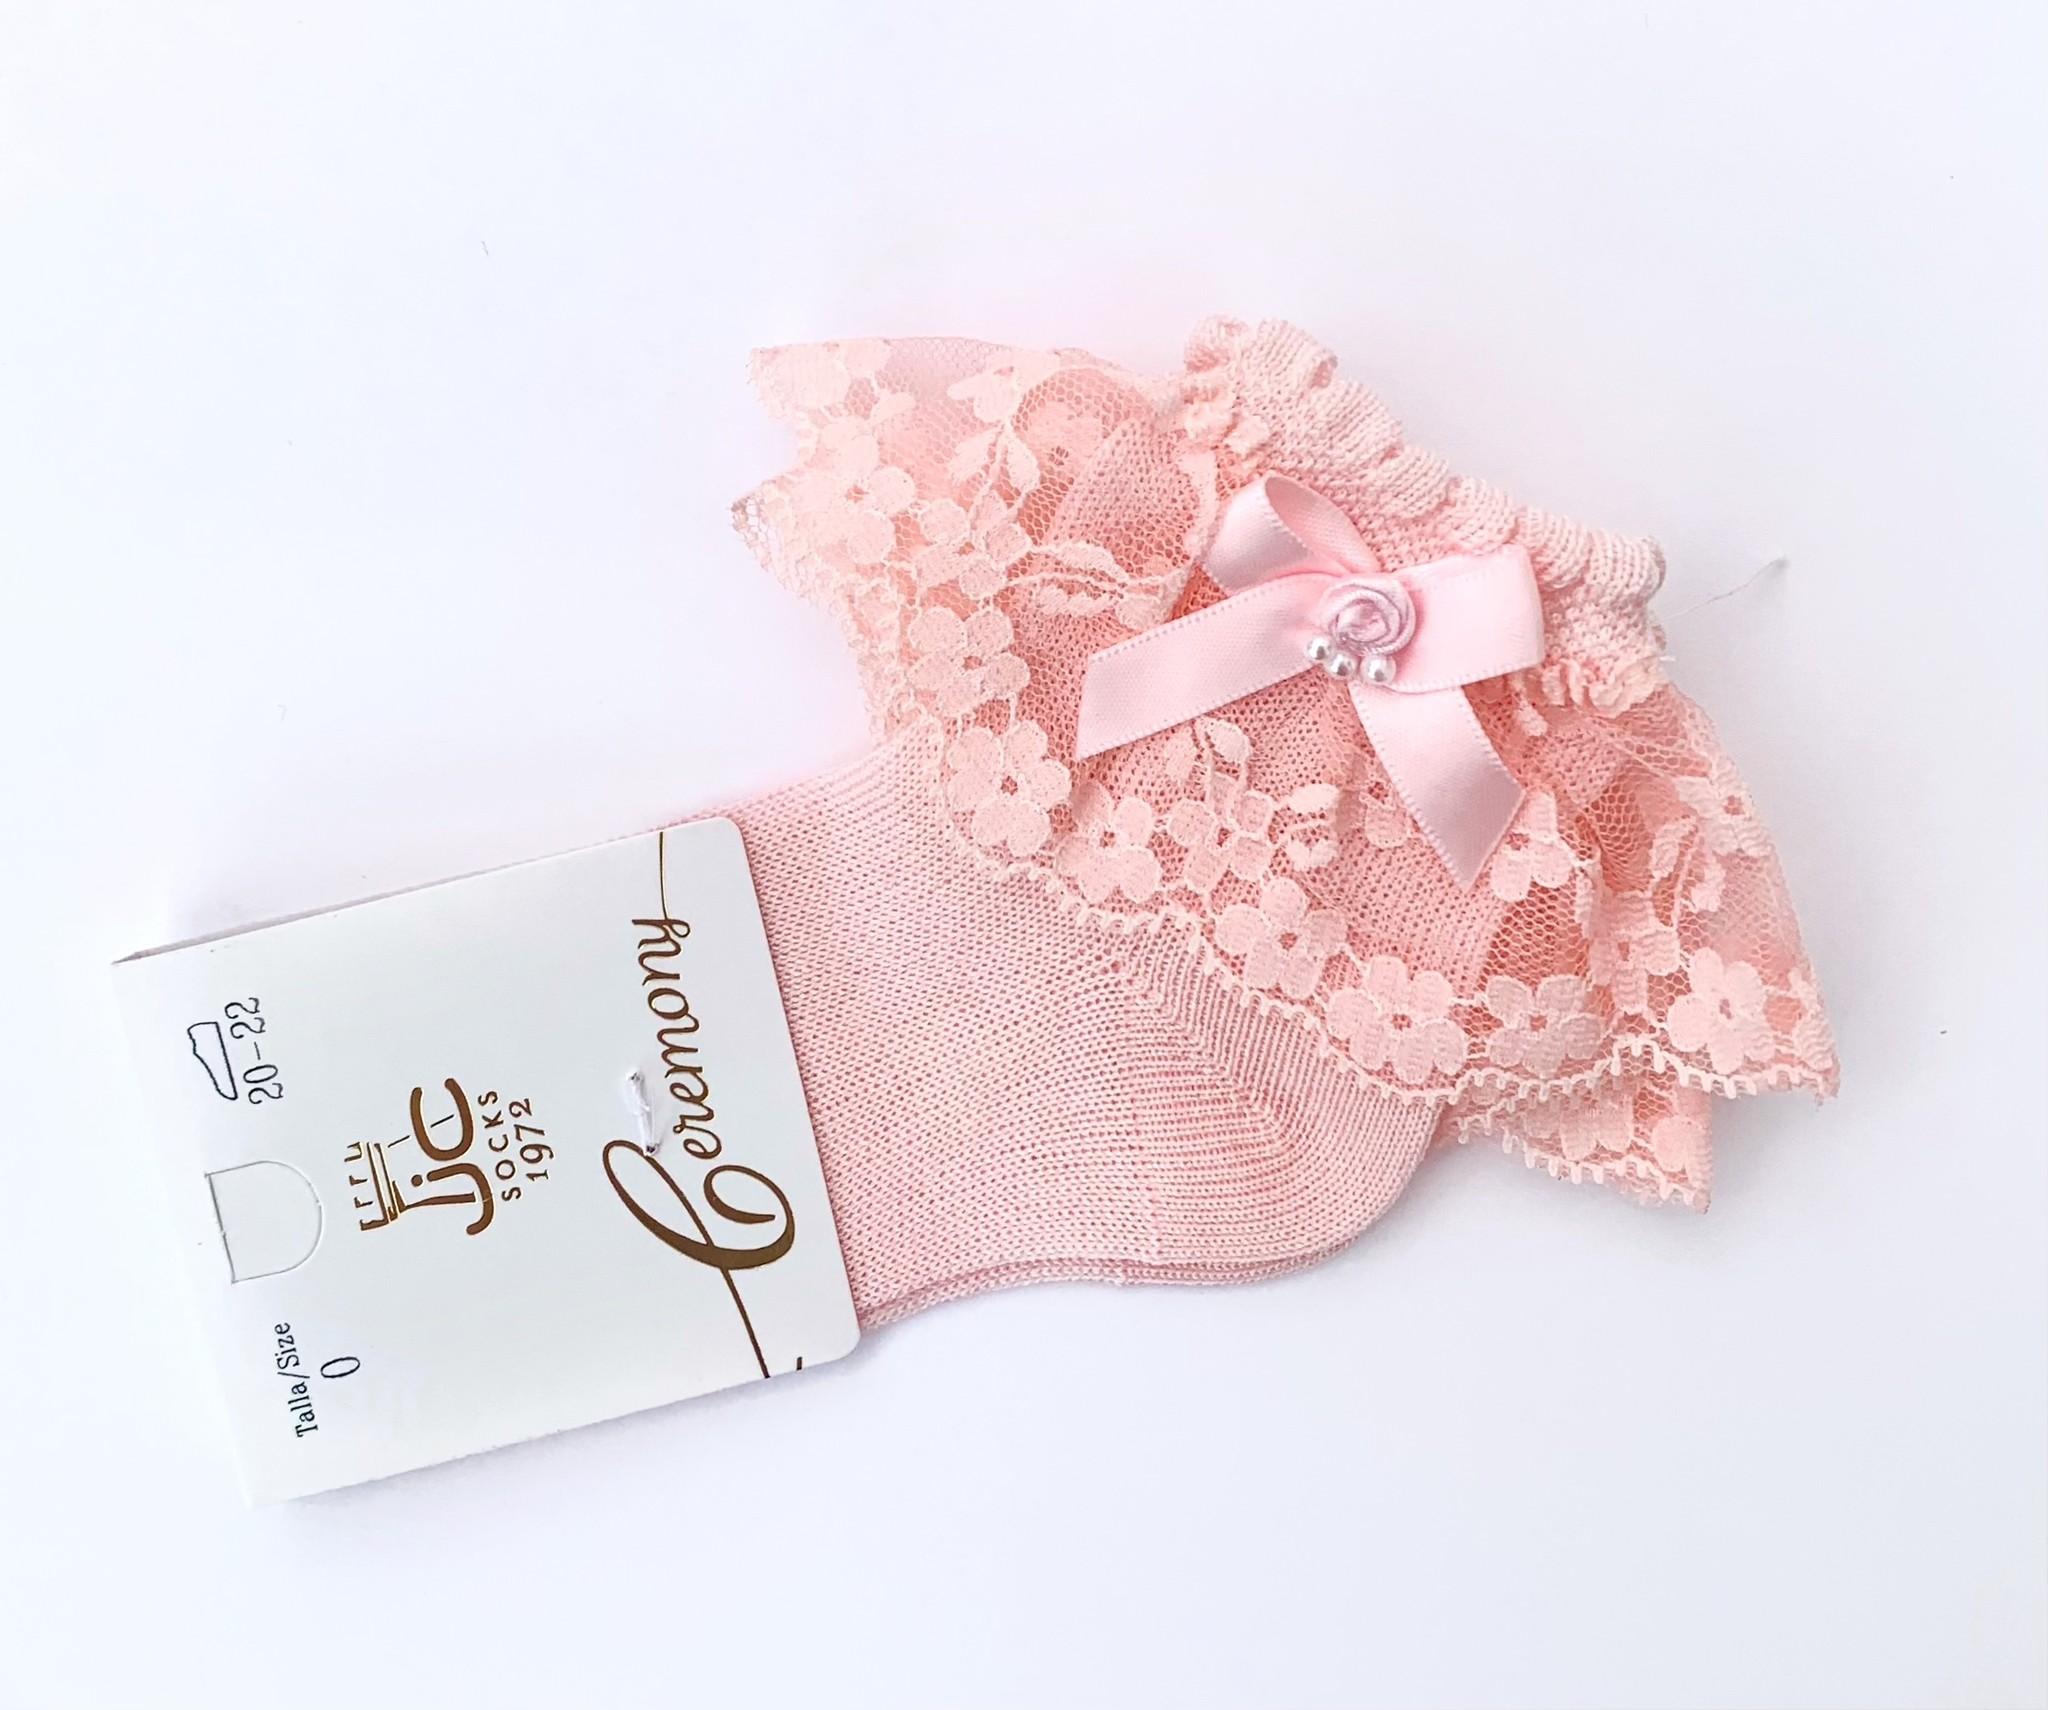 JC Socks JC Socks Pink Lace Ankle Socks 32635